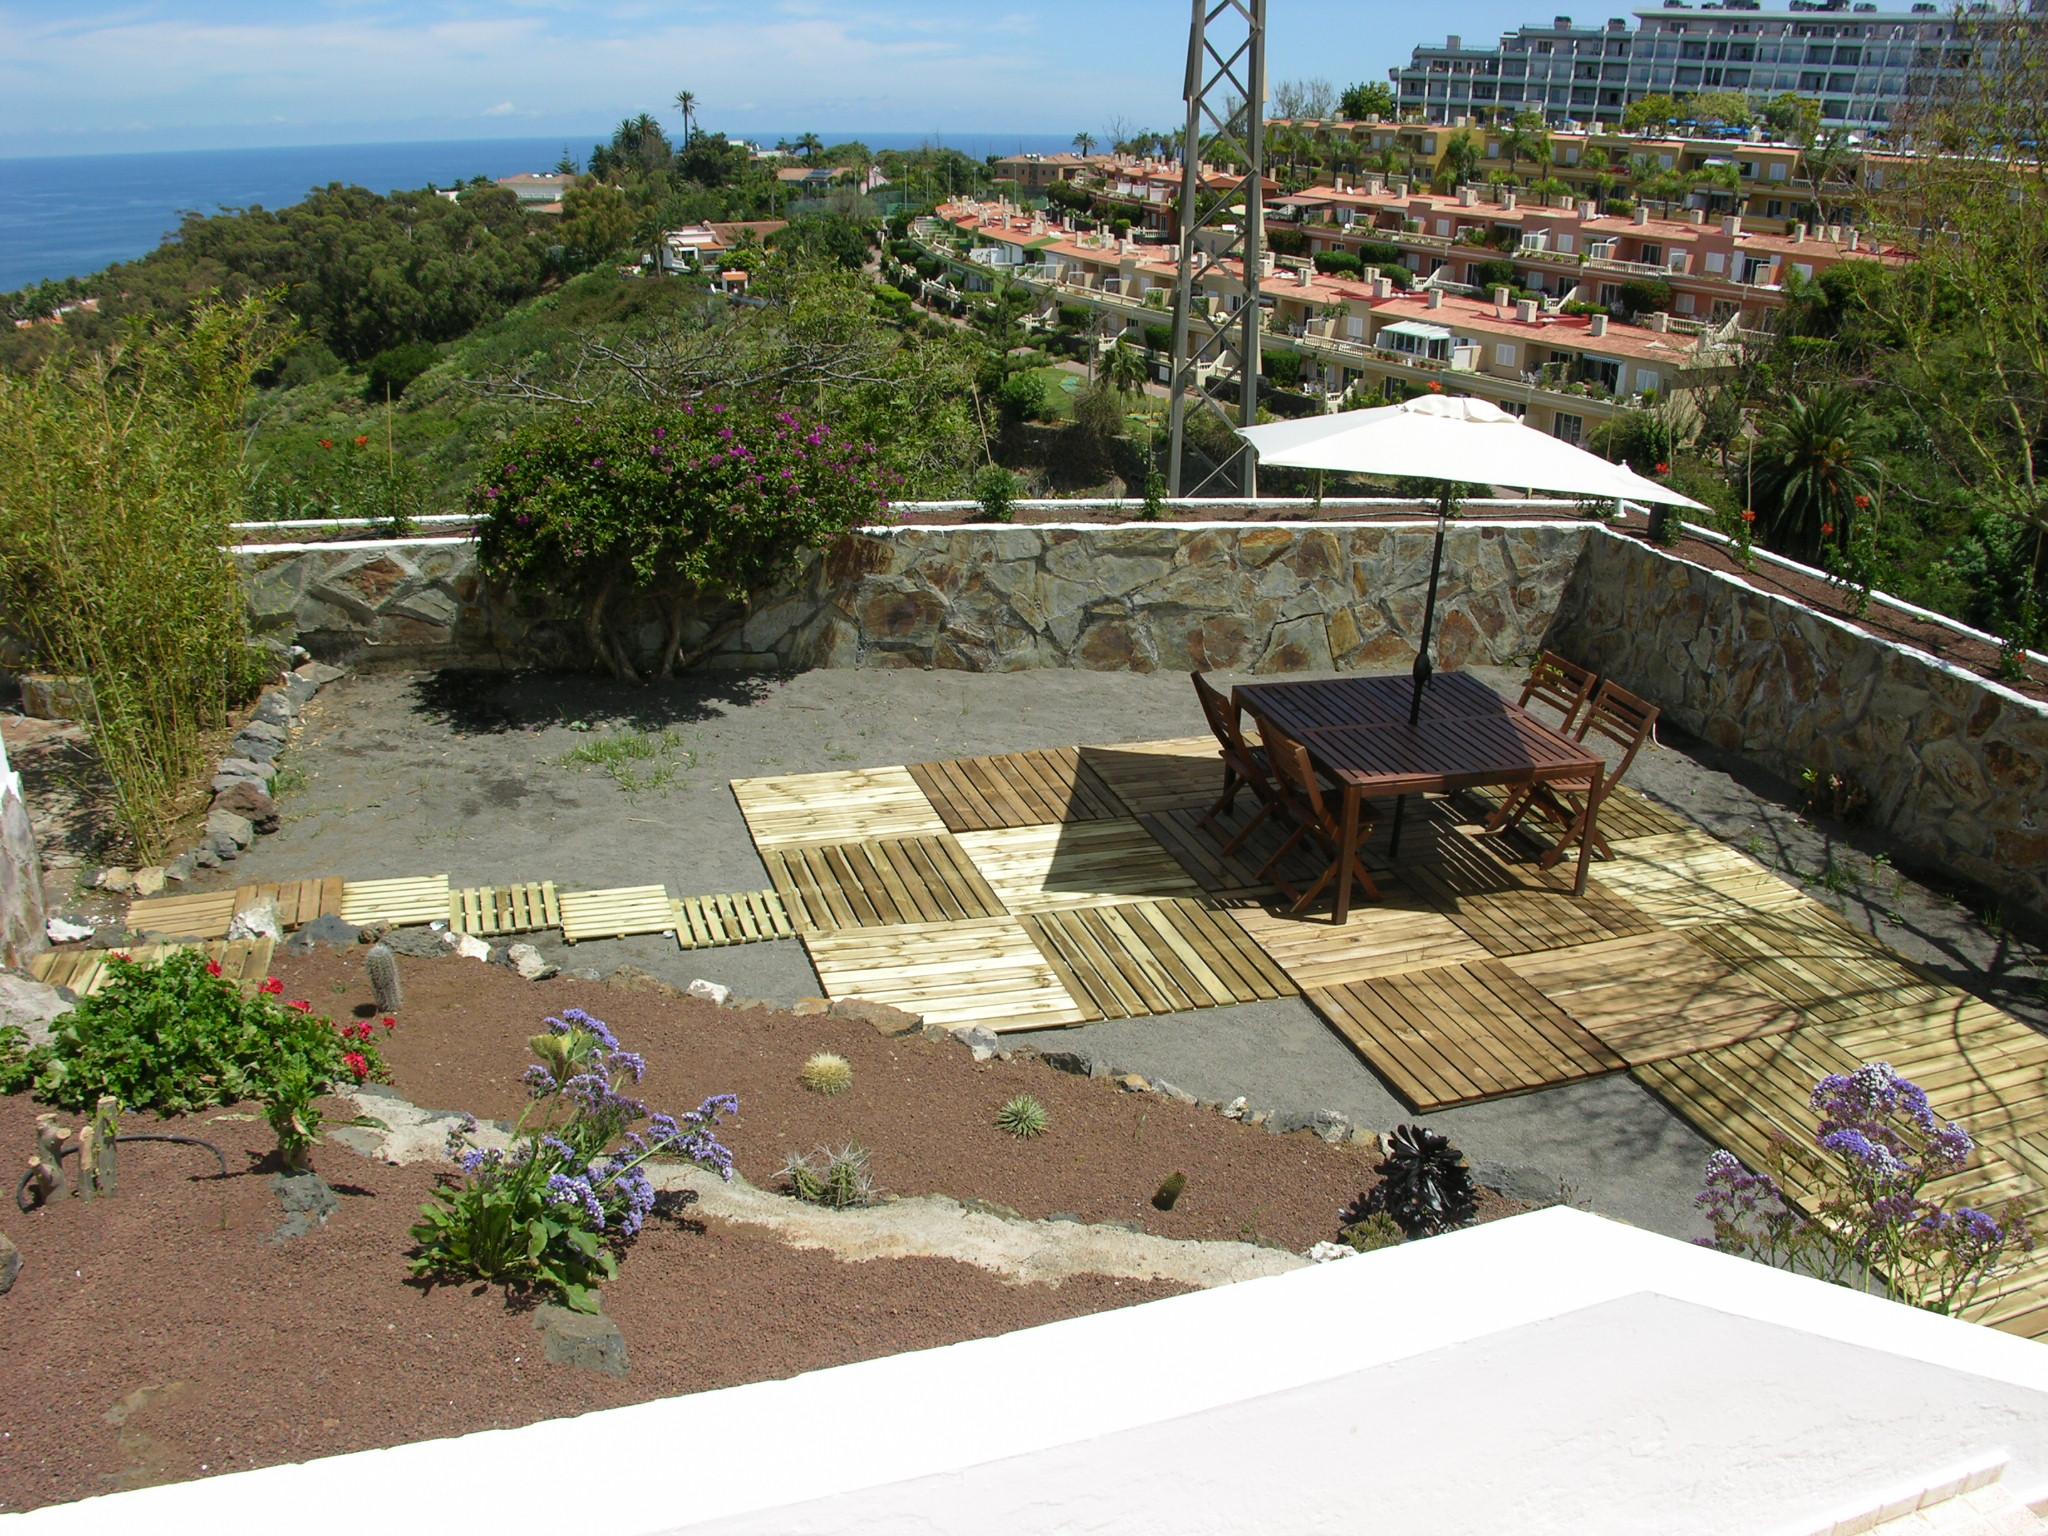 Maison de vacances Villa Vista La Quinta beheizbarer Pool kostenloses WLAN Grill (2124407), Santa Ursula, Ténérife, Iles Canaries, Espagne, image 12